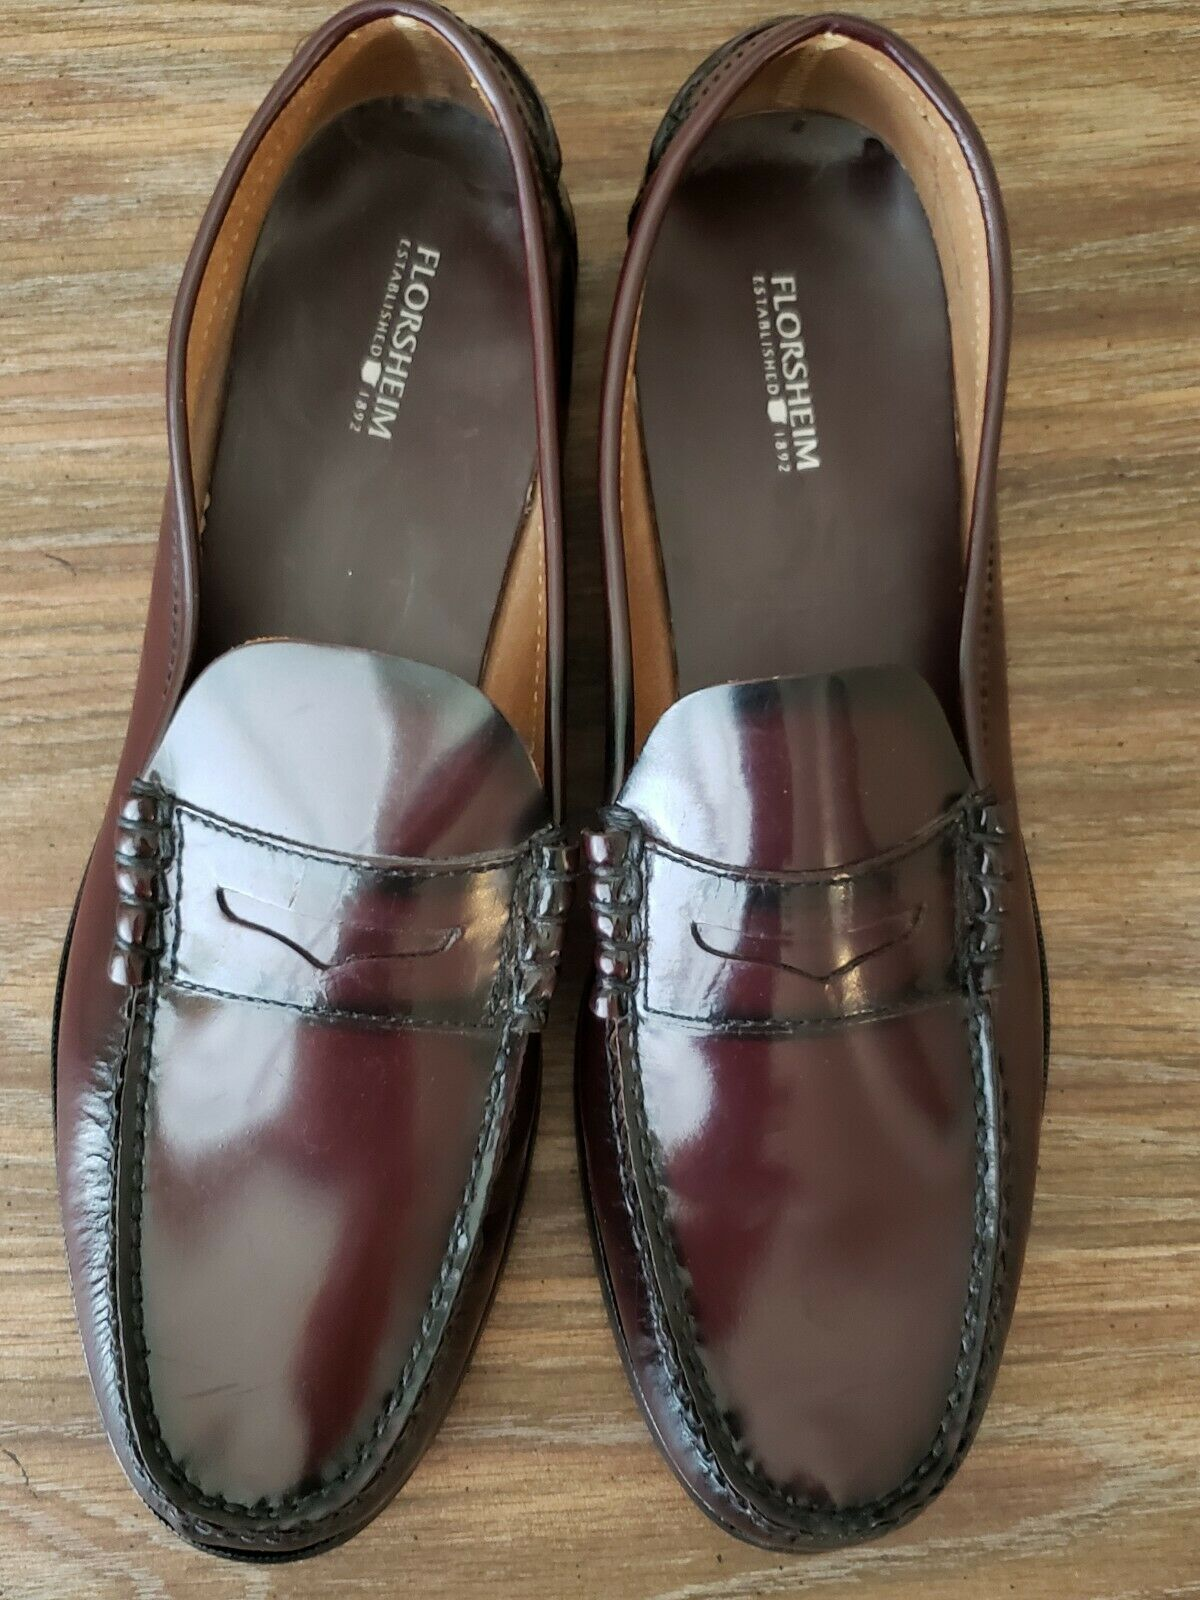 Florsheim Imperial size 13 mens slip on loafer cognac brown new shoes formal shoe